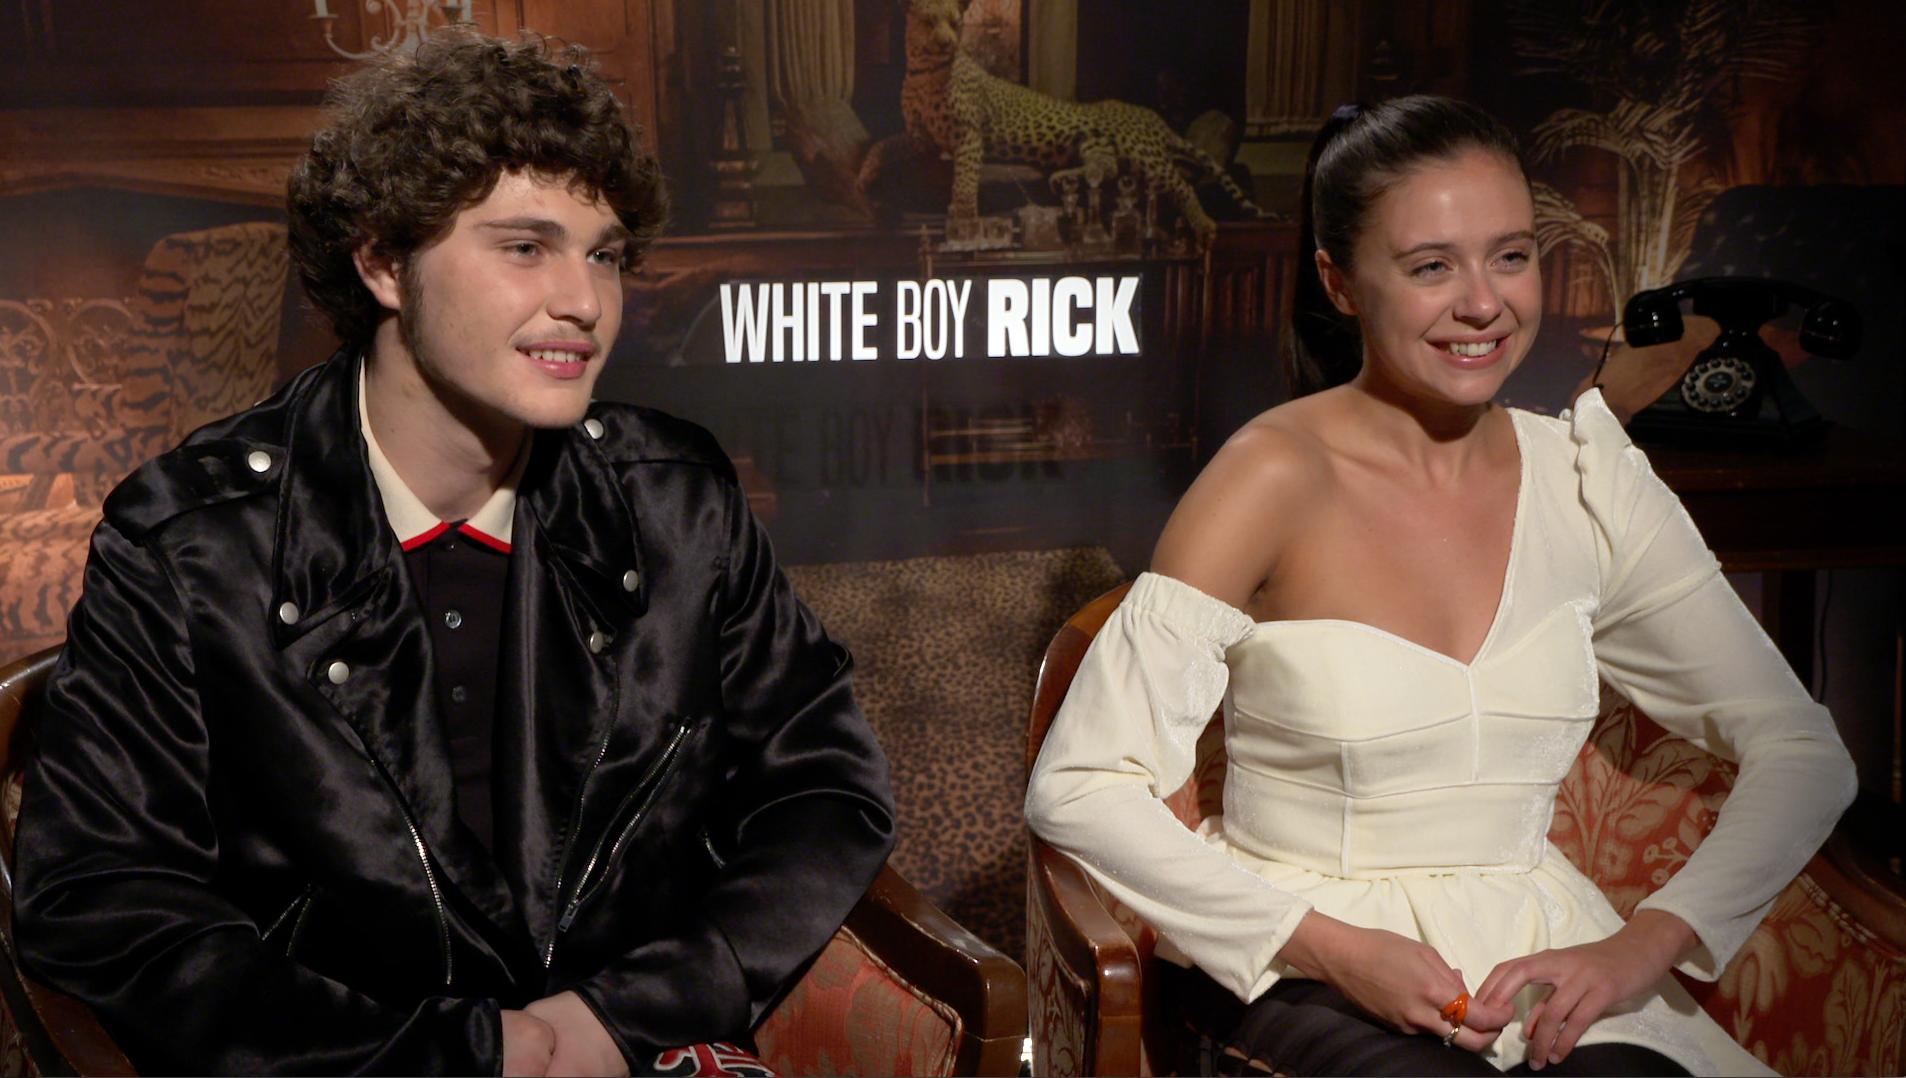 White Boy Rick Interview with Richie Merritt & Bel Powley